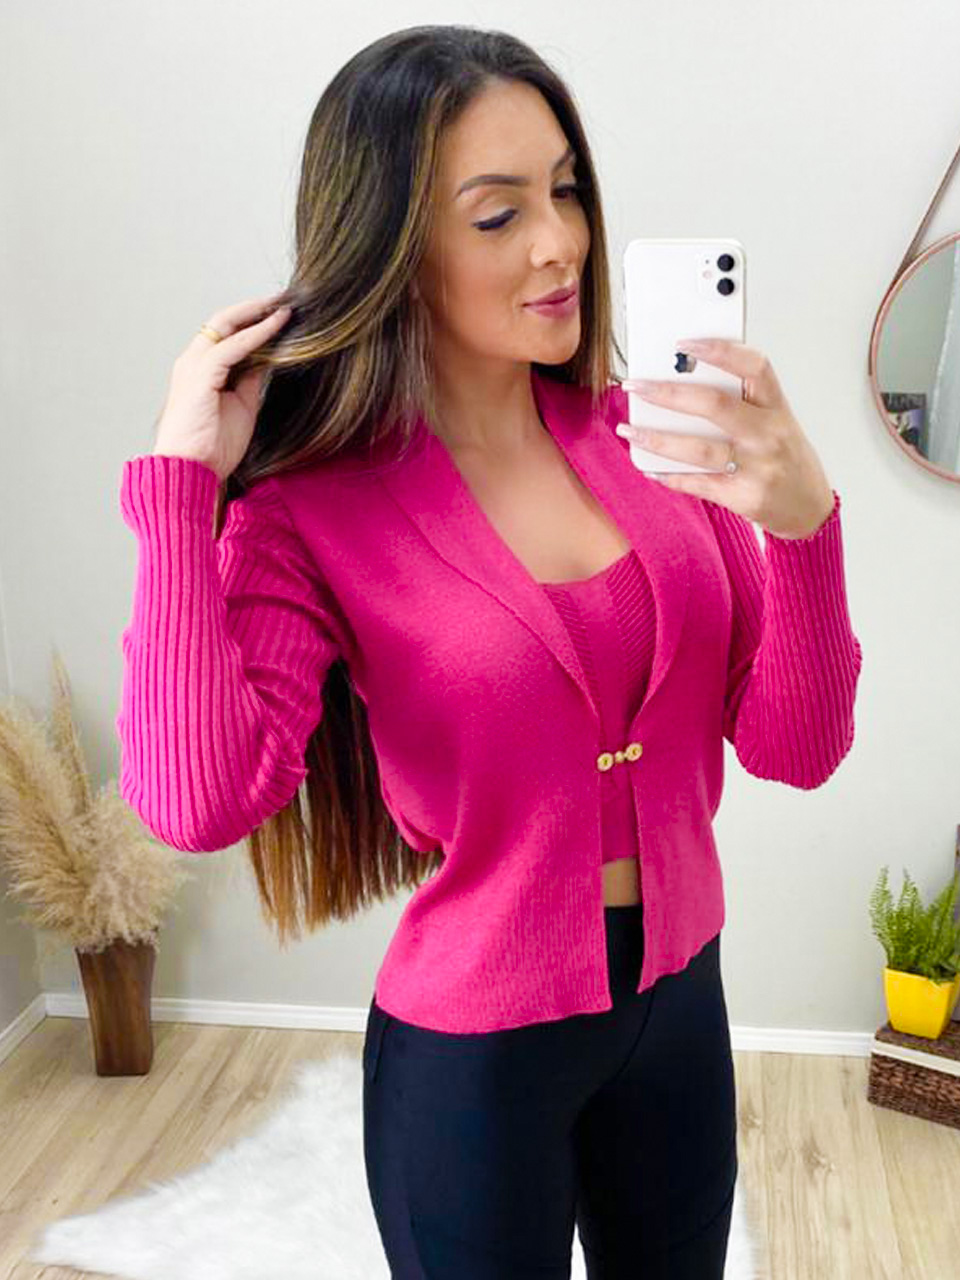 Cjto Tricot Casaco Cropped POT 58 Pink